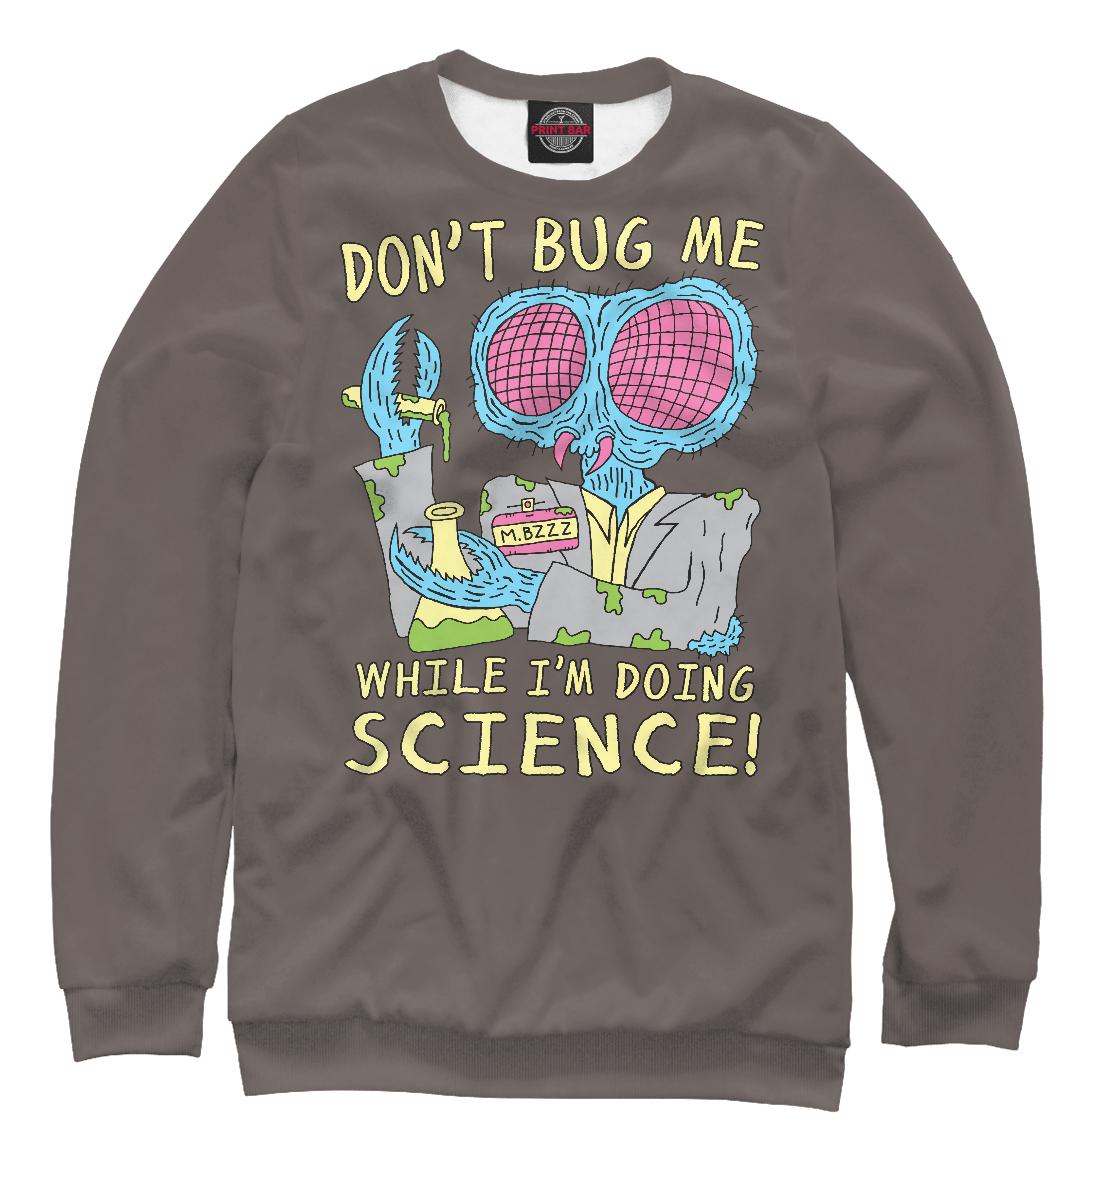 Купить Don't bug me while I'm doing science!, Printbar, Свитшоты, PSY-992489-swi-2